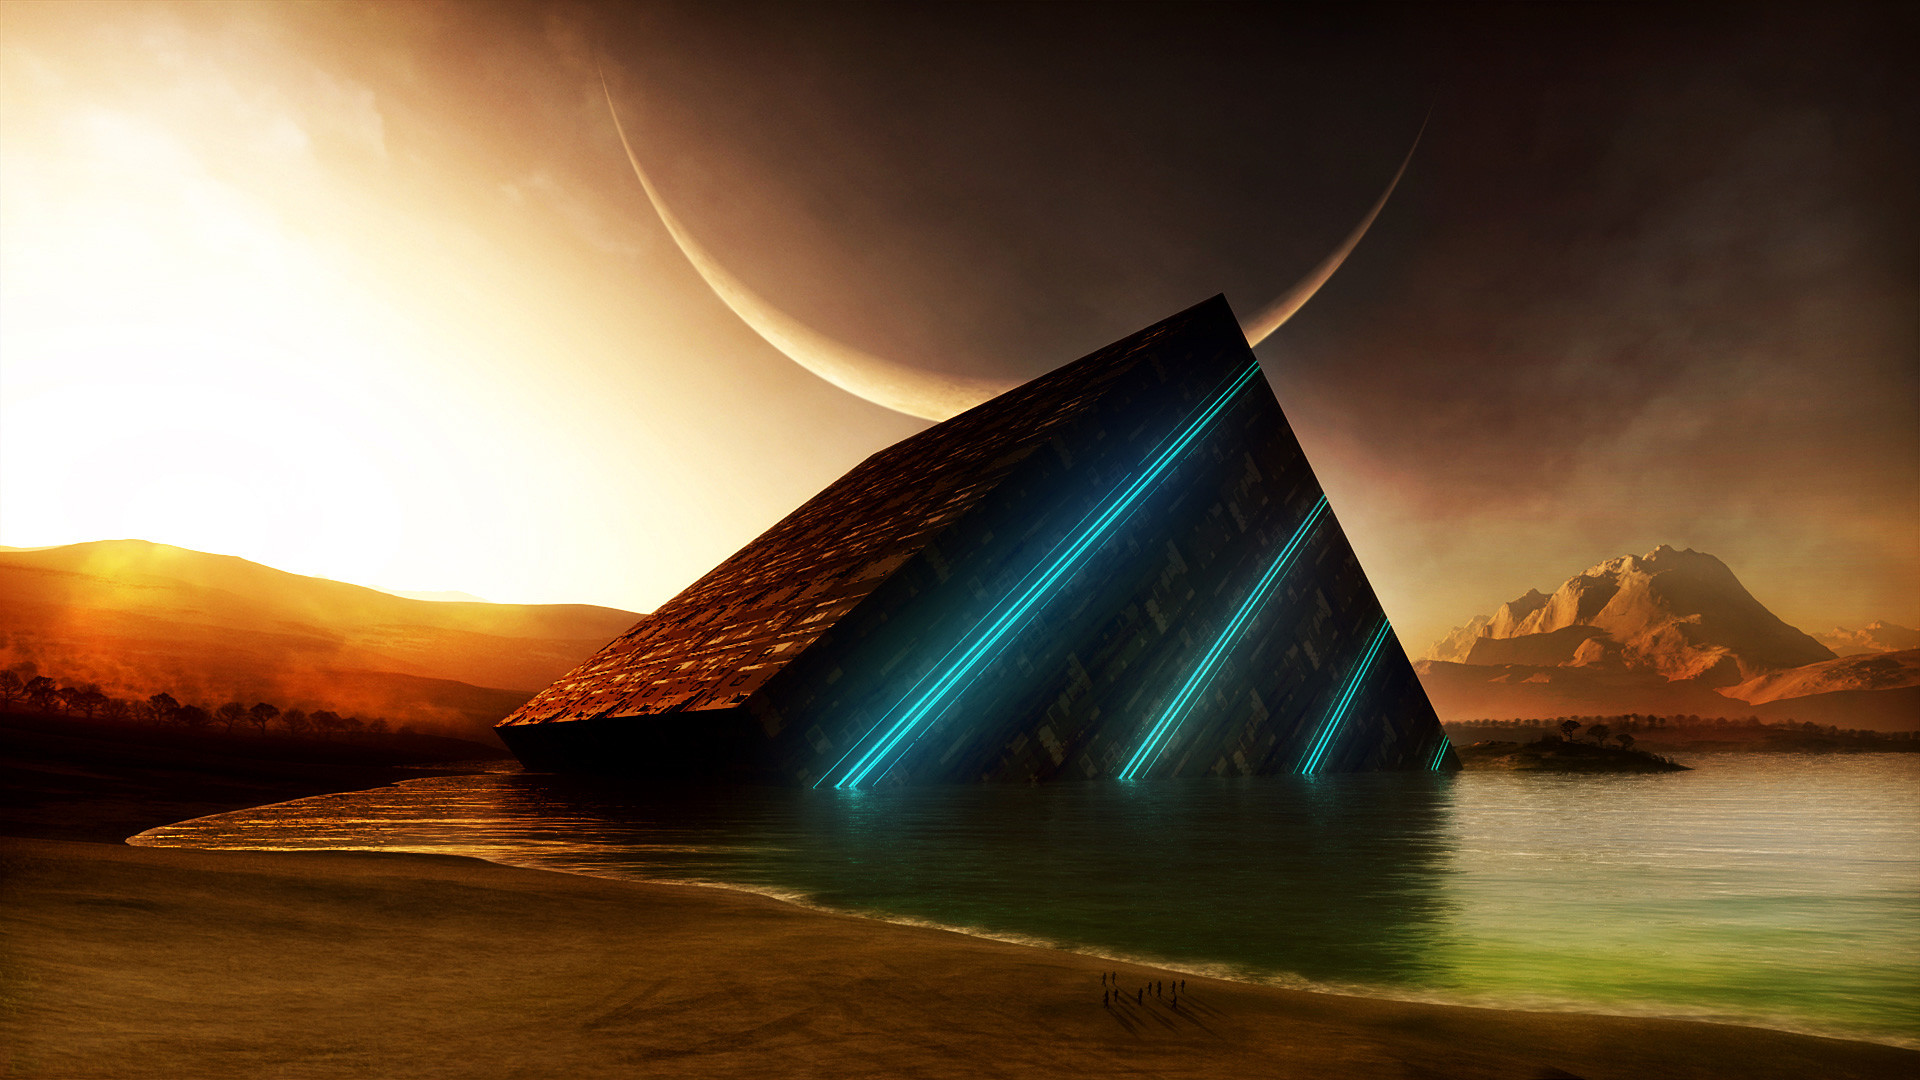 Sci Fi Landscape Wallpaper Desktop Background #tdj